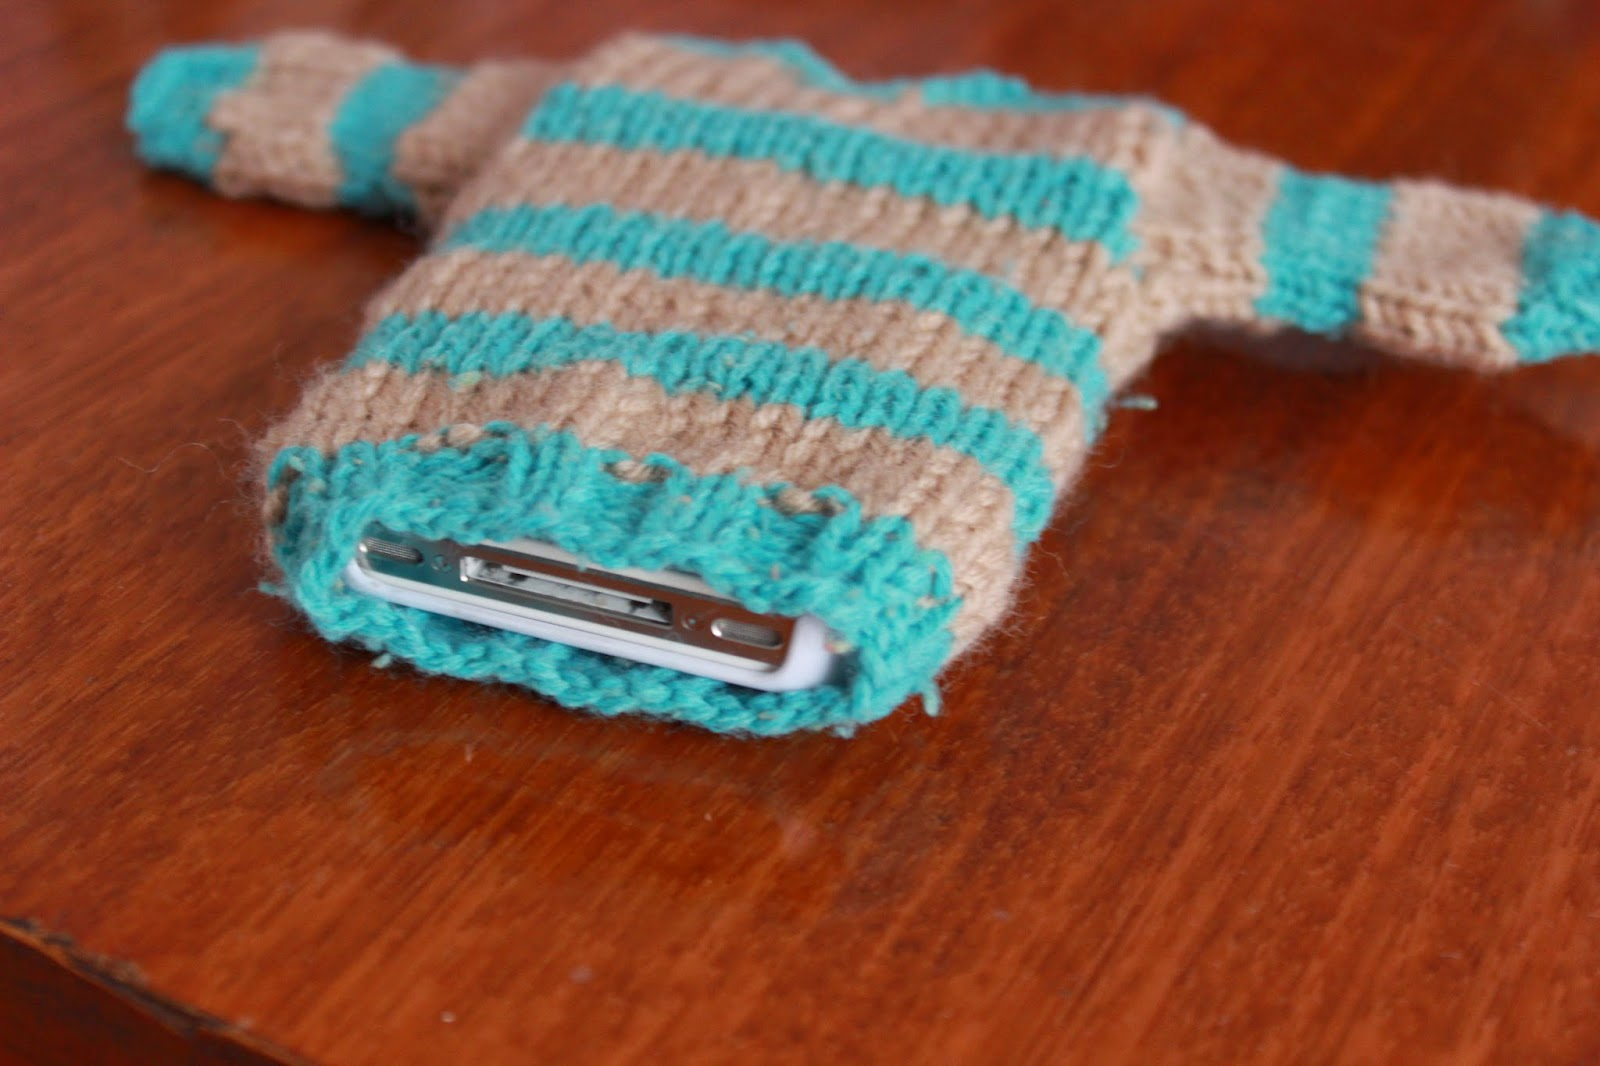 чехол для телефона, чехол для айфона, чехол для девайса, чехол для гаджета, чехлы заказать, чехол своими руками, хендмейд, свитер для телефона, свитер для игрушек.